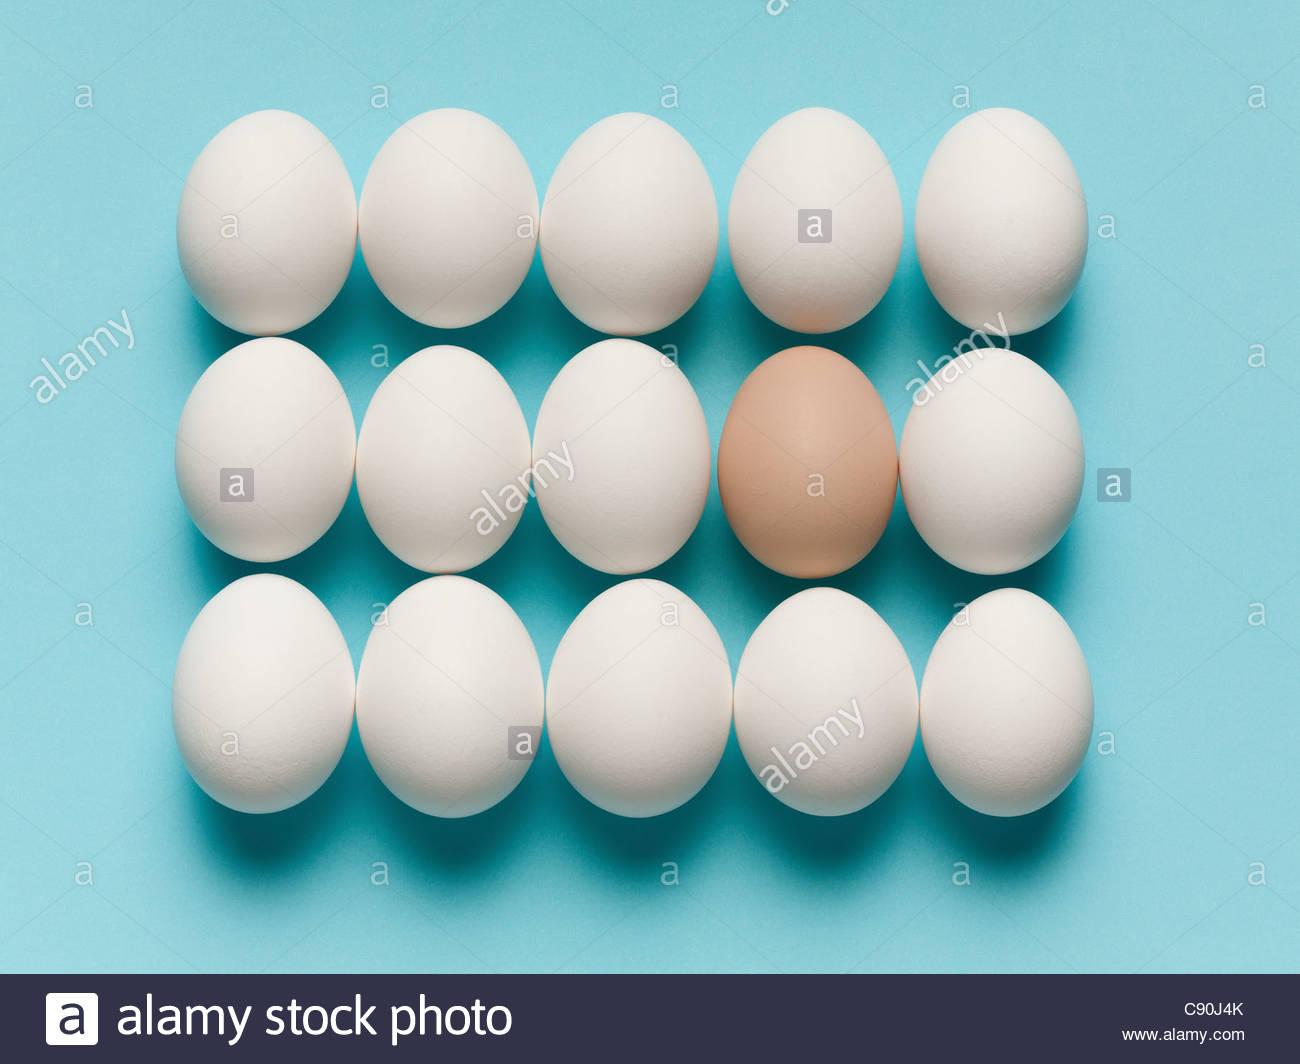 Brown egg avec de gros oeufs blancs Photo Stock